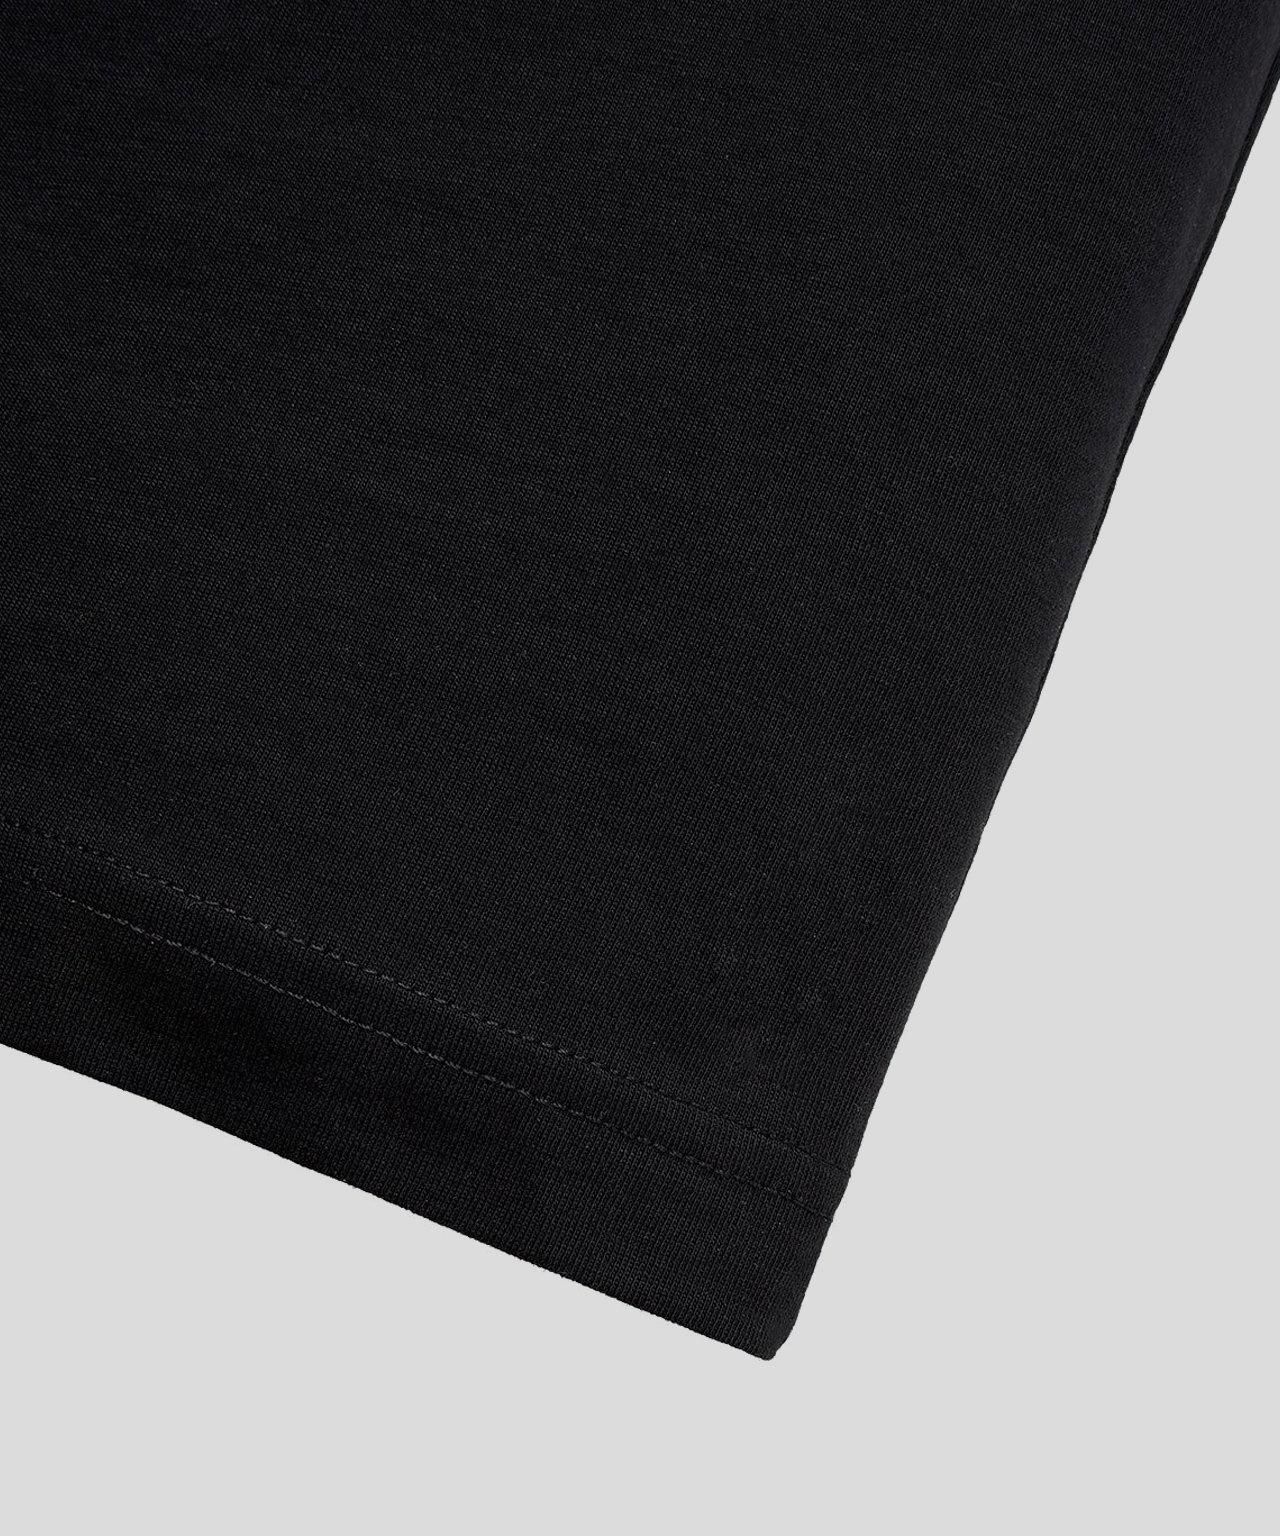 Ron Dorff DAD smll prnt tshirt Black